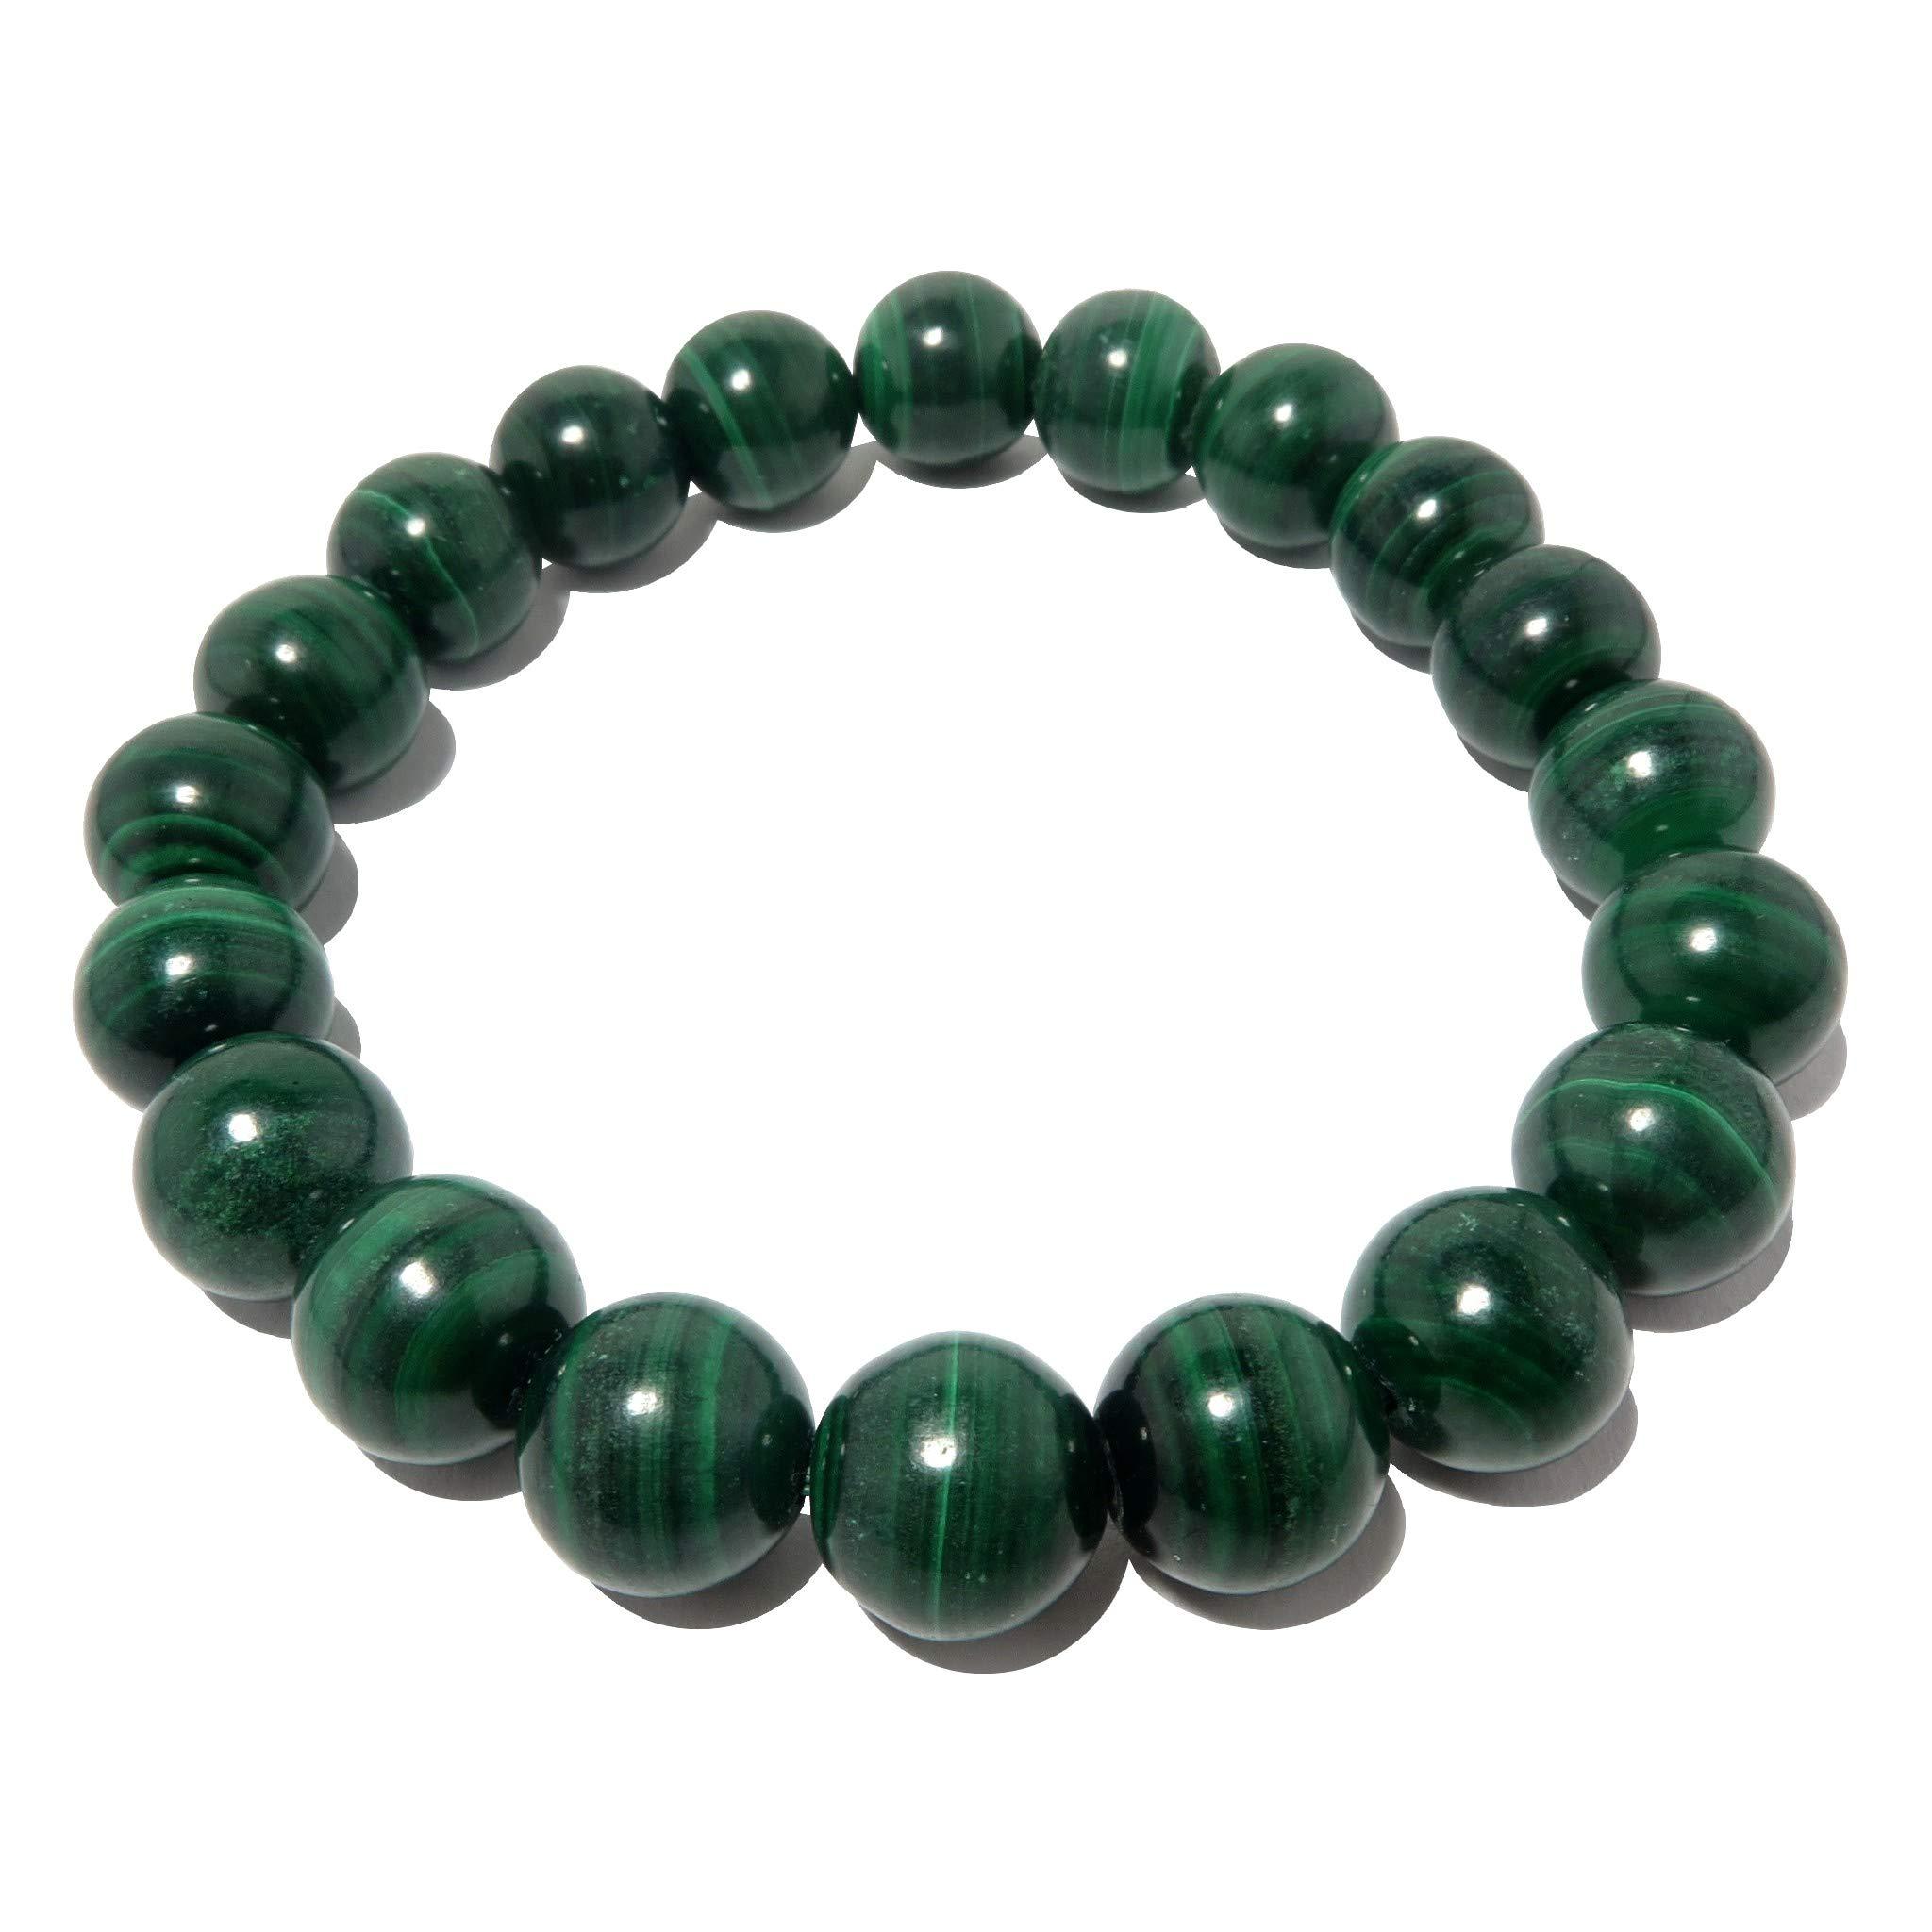 SatinCrystals Malachite Bracelet 9mm Boutique Genuine Banded Green Gemstone Round Stretch Handmade B02 (7.75'')